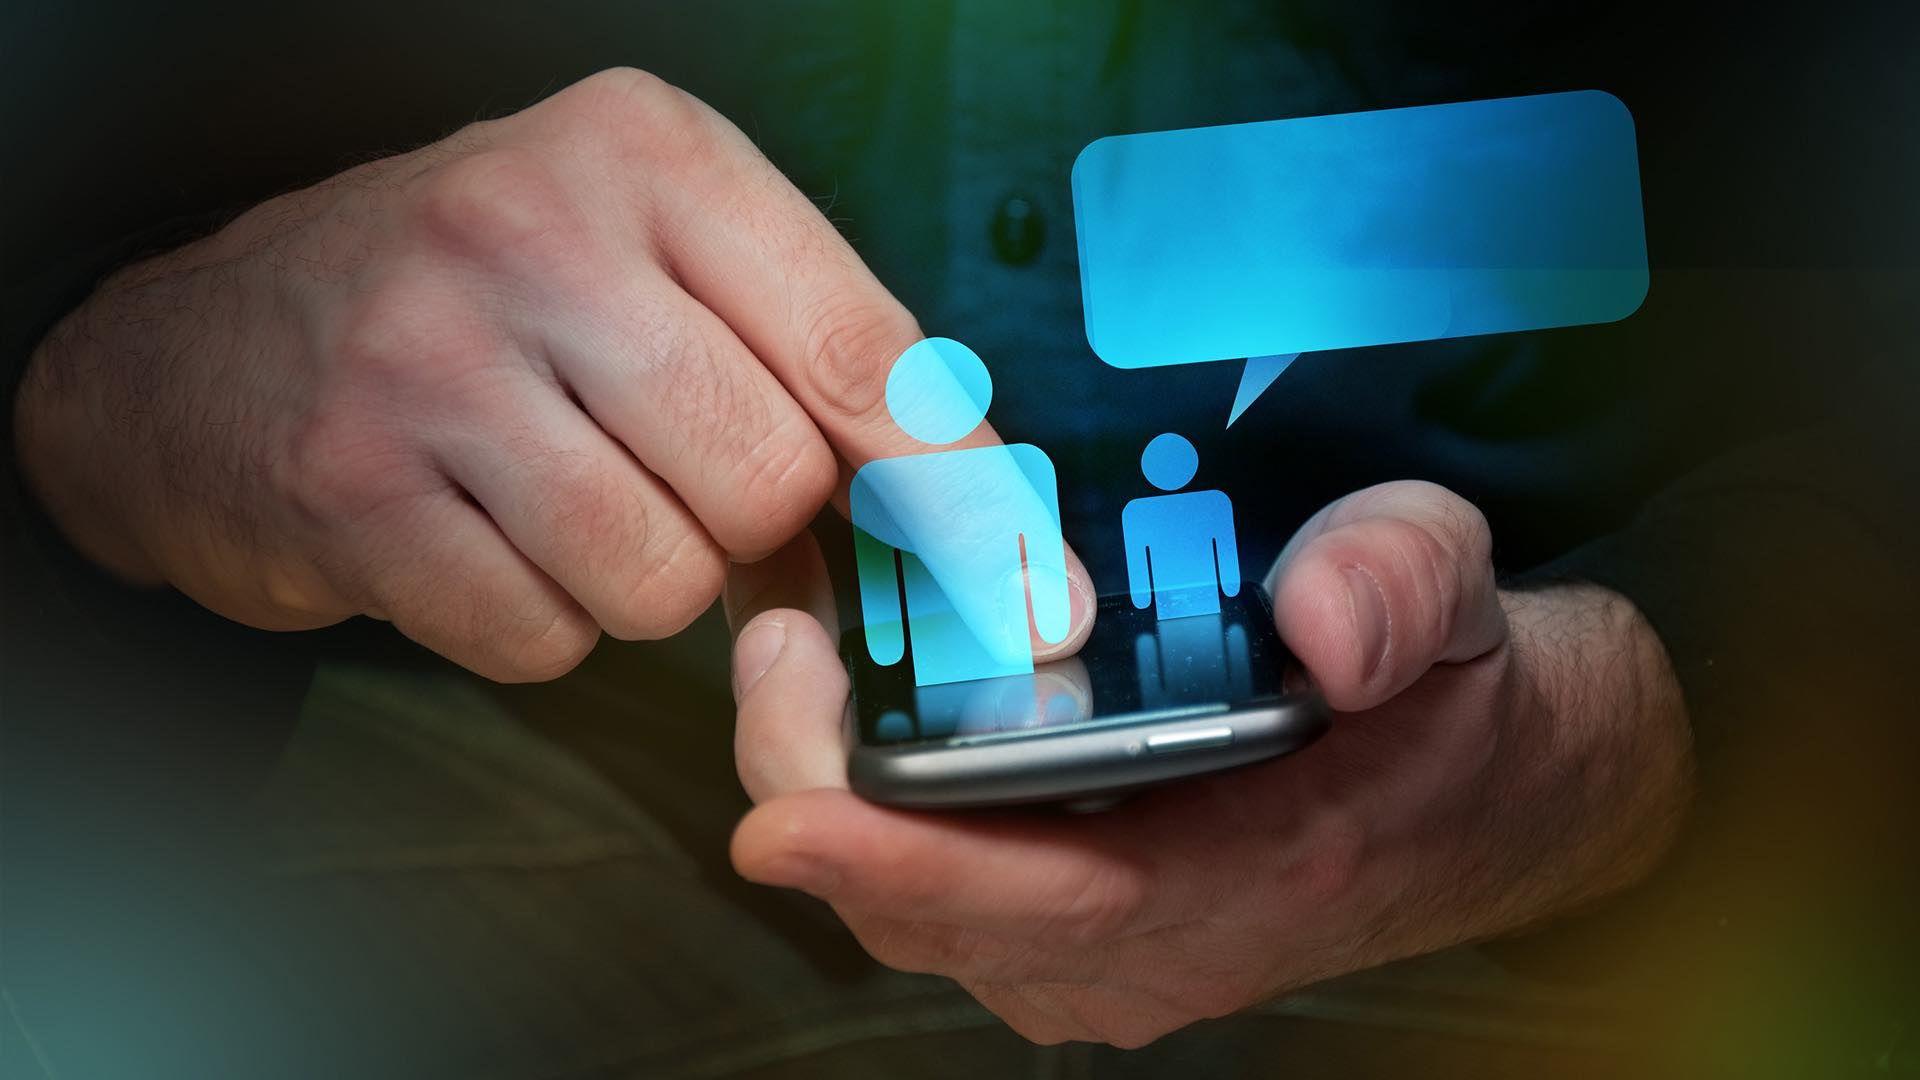 Domestic Messaging Apps in Iran Bidding Big